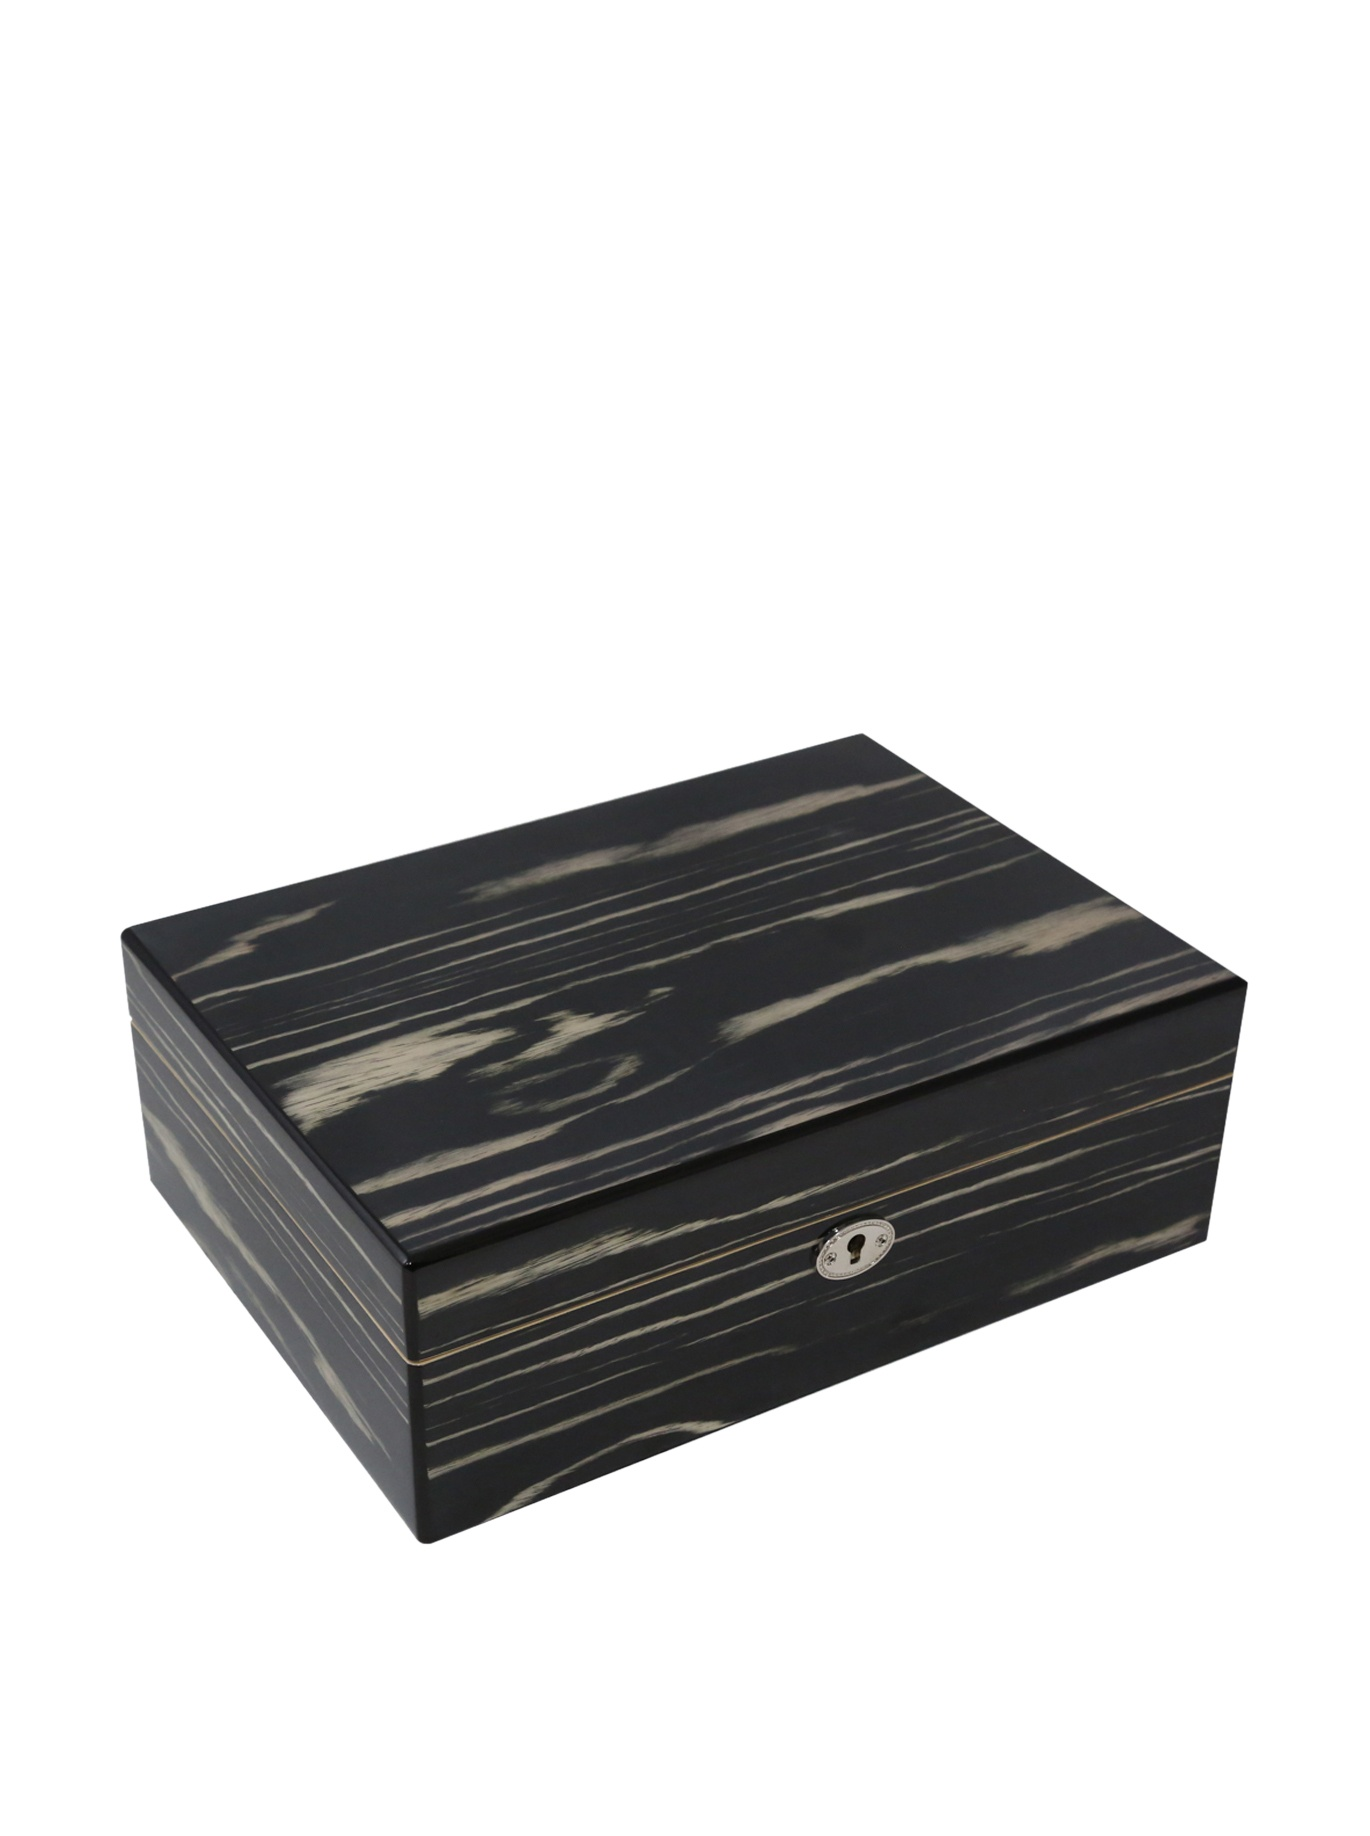 2 Level Jewelry Box by Bey-Berk